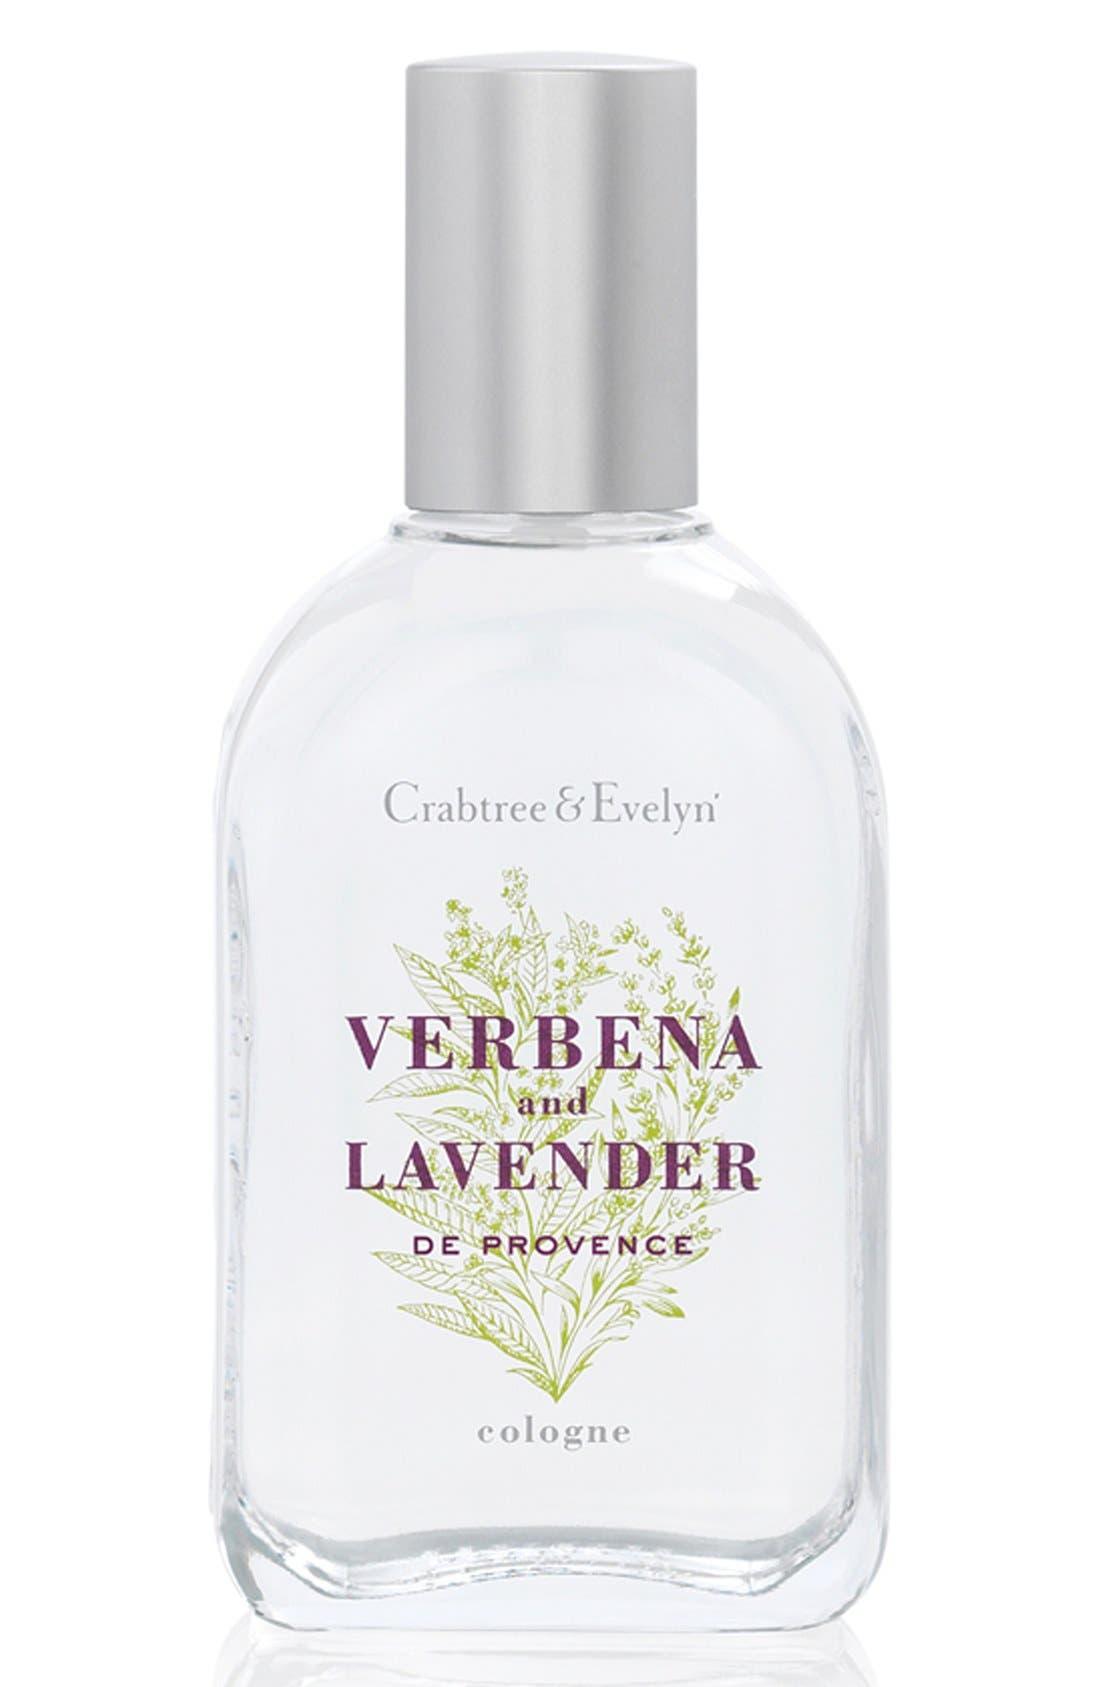 Crabtree & Evelyn 'Verbena & Lavender de Provence' Eau de Toilette (Nordstrom Exclusive)